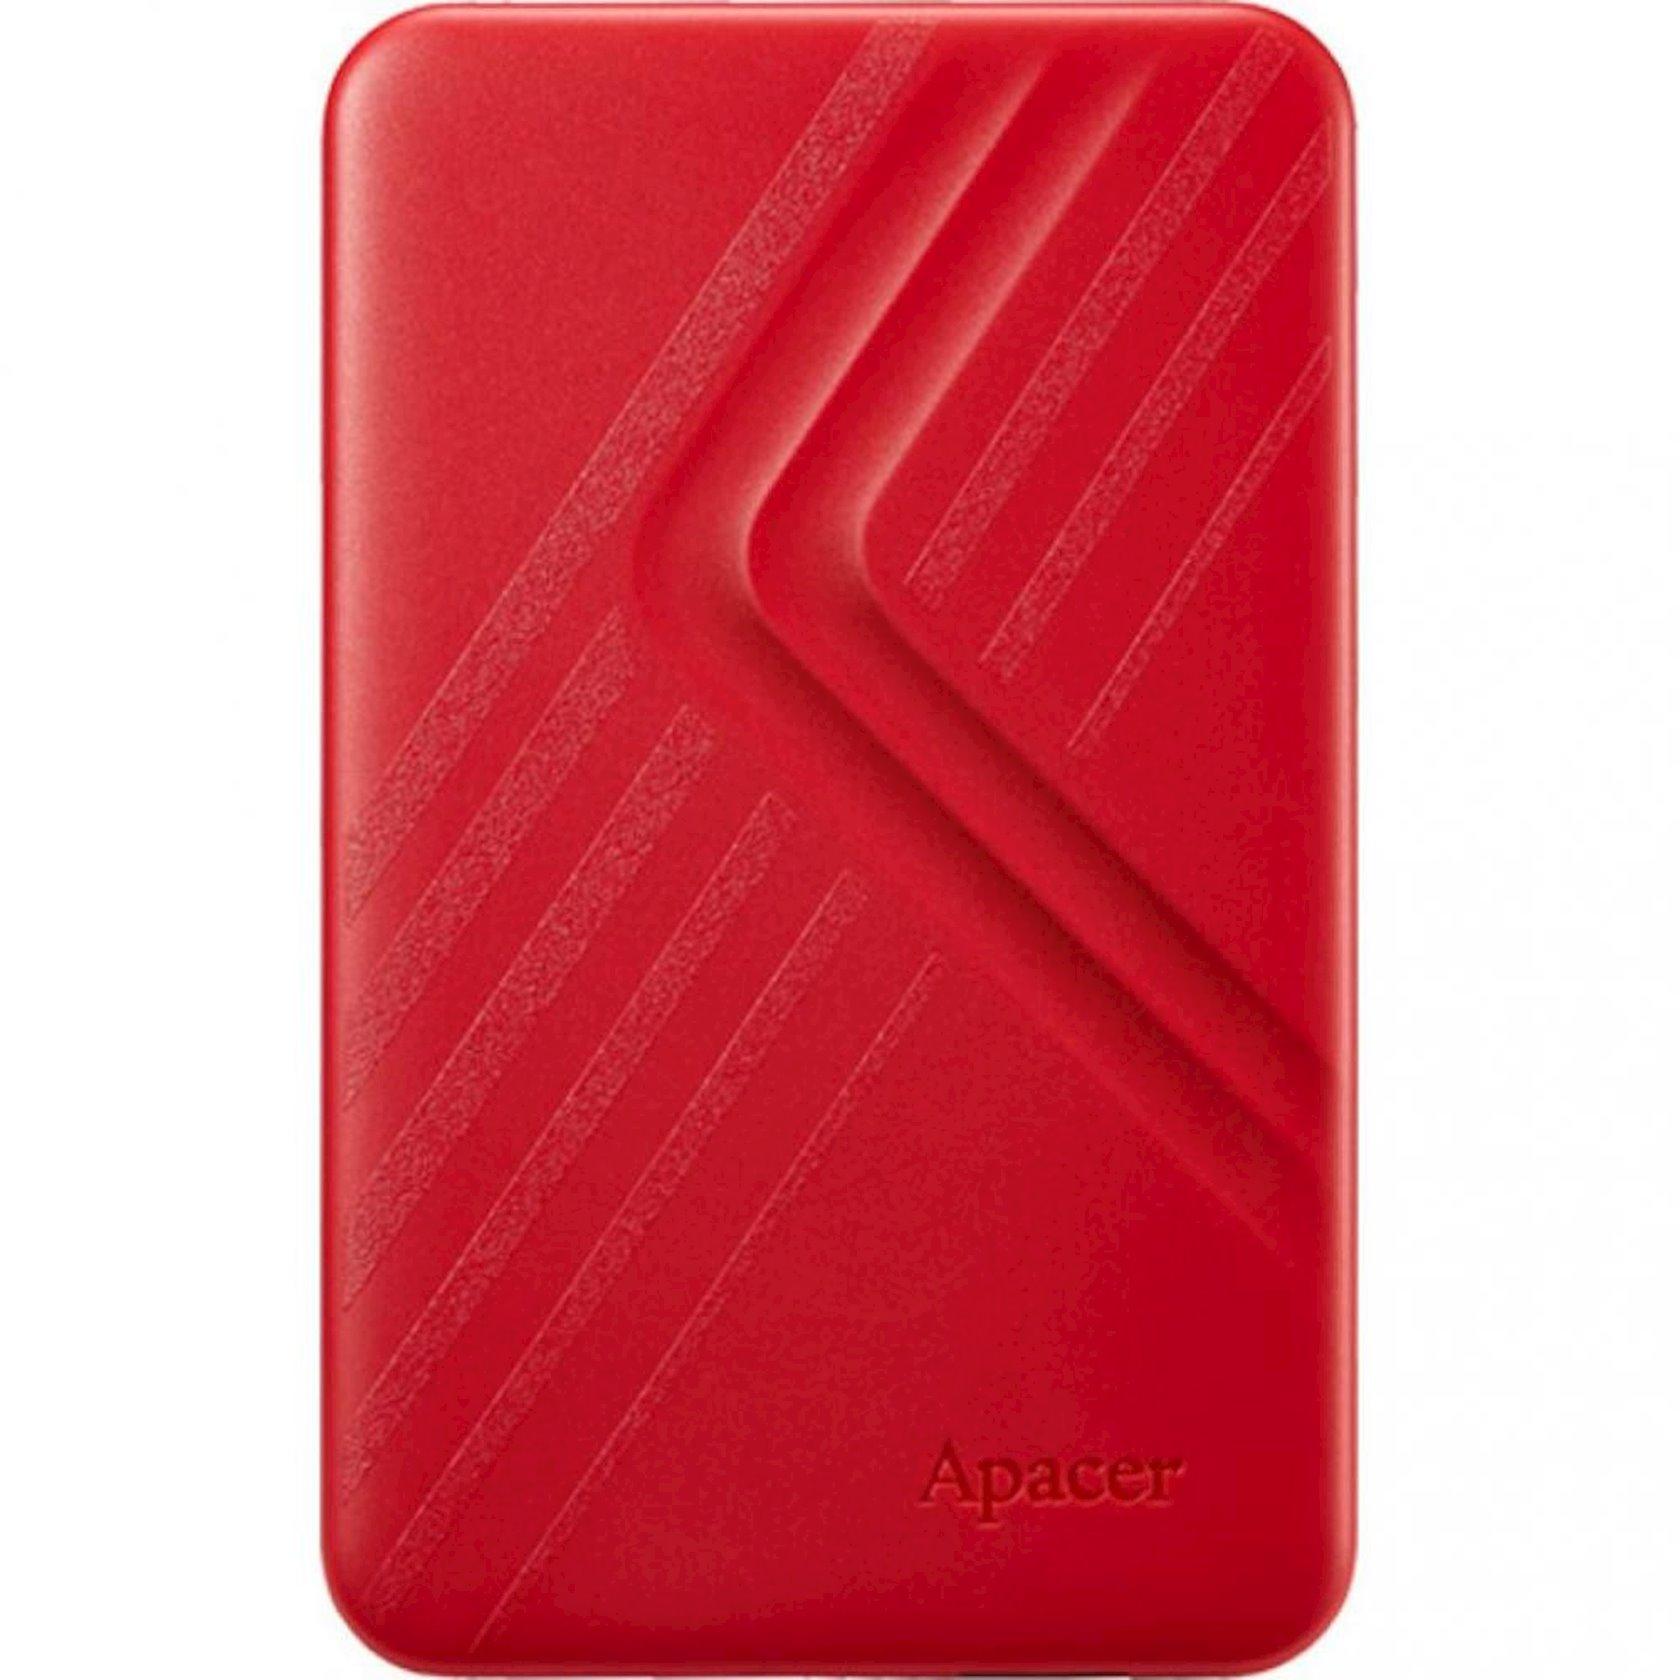 Xarici sərt disk Apacer 2 TB USB 3.1 Portable Hard Drive AC236 Red